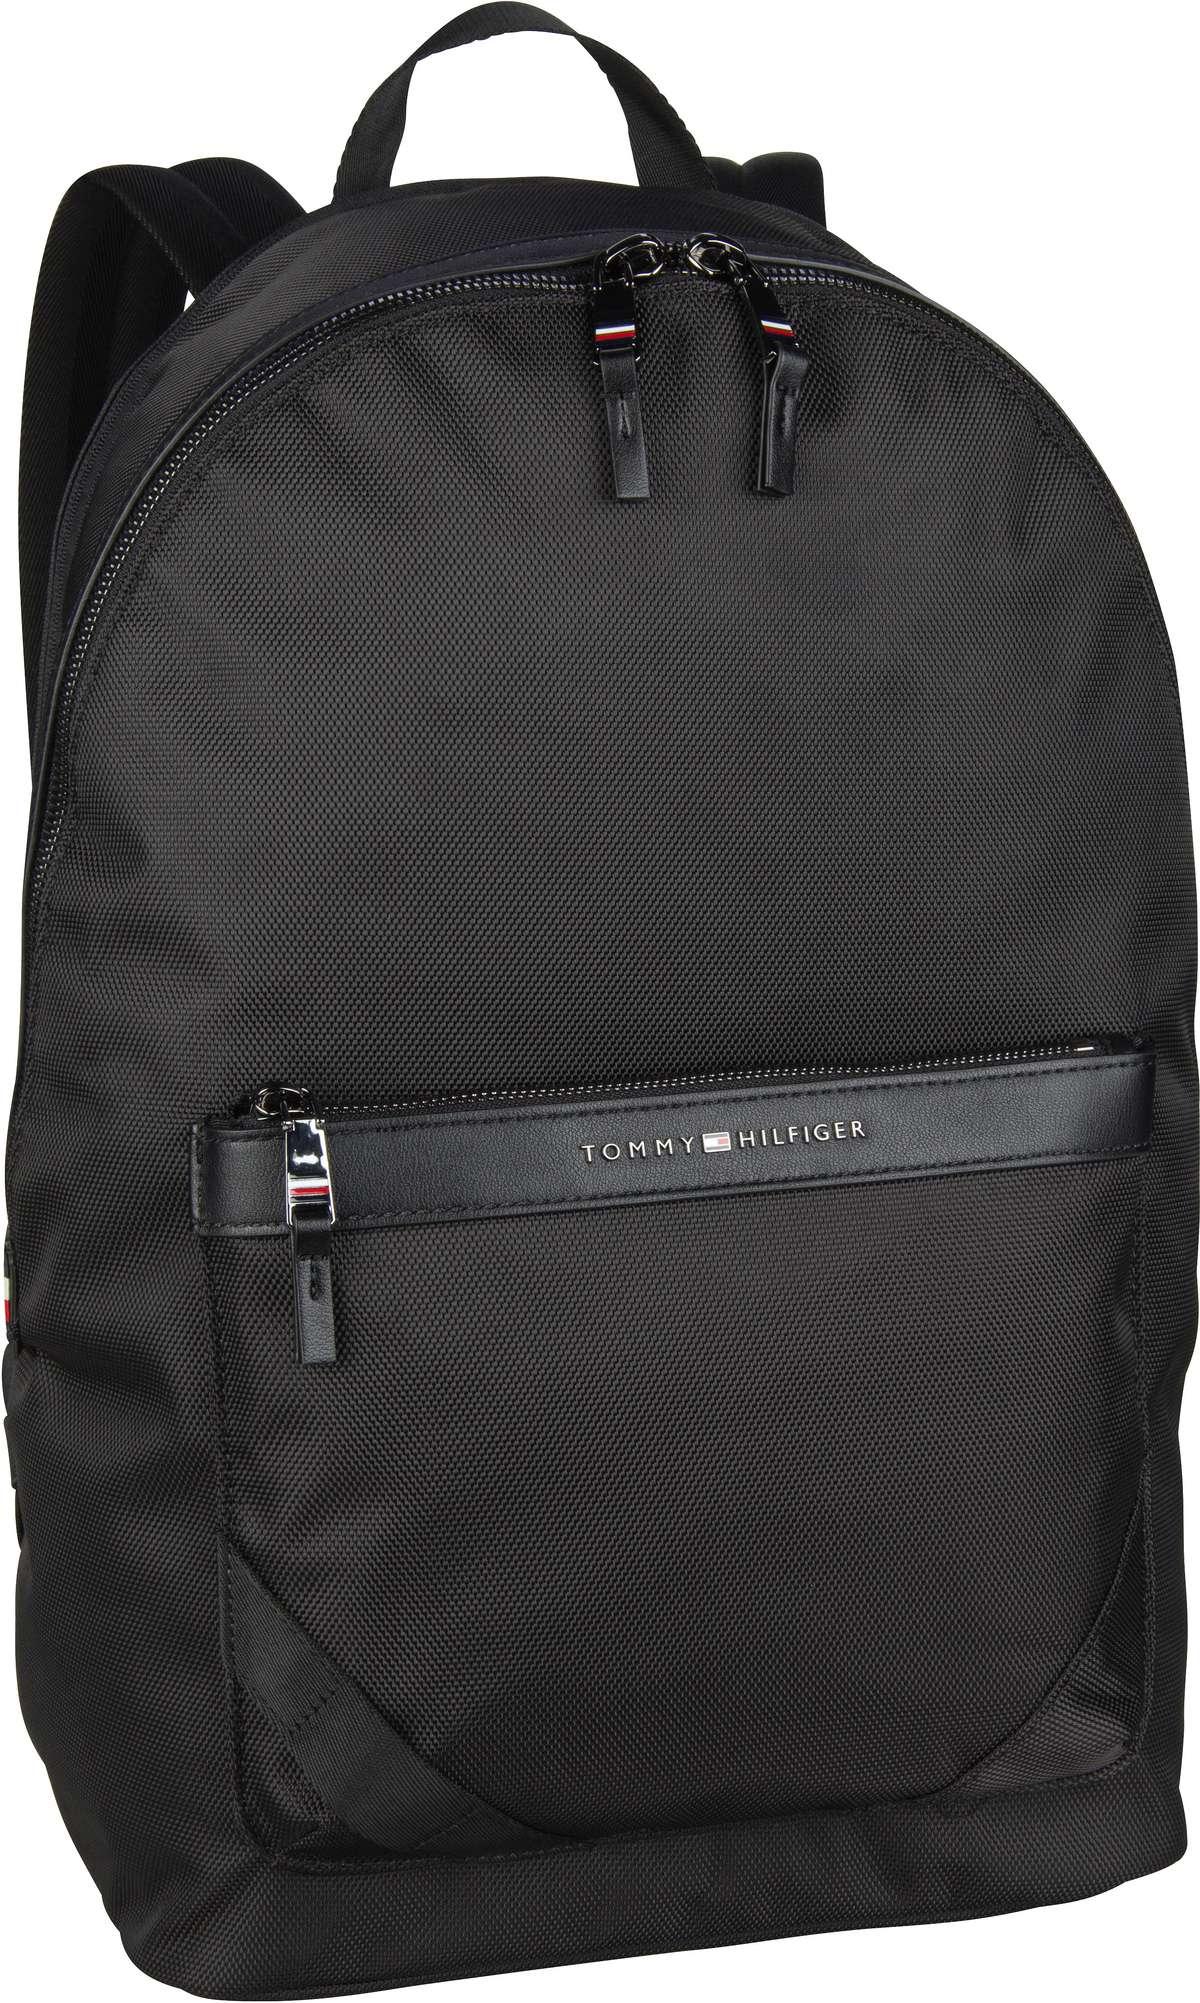 Rucksack / Daypack Elevated Nylon Backpack 5261 Black